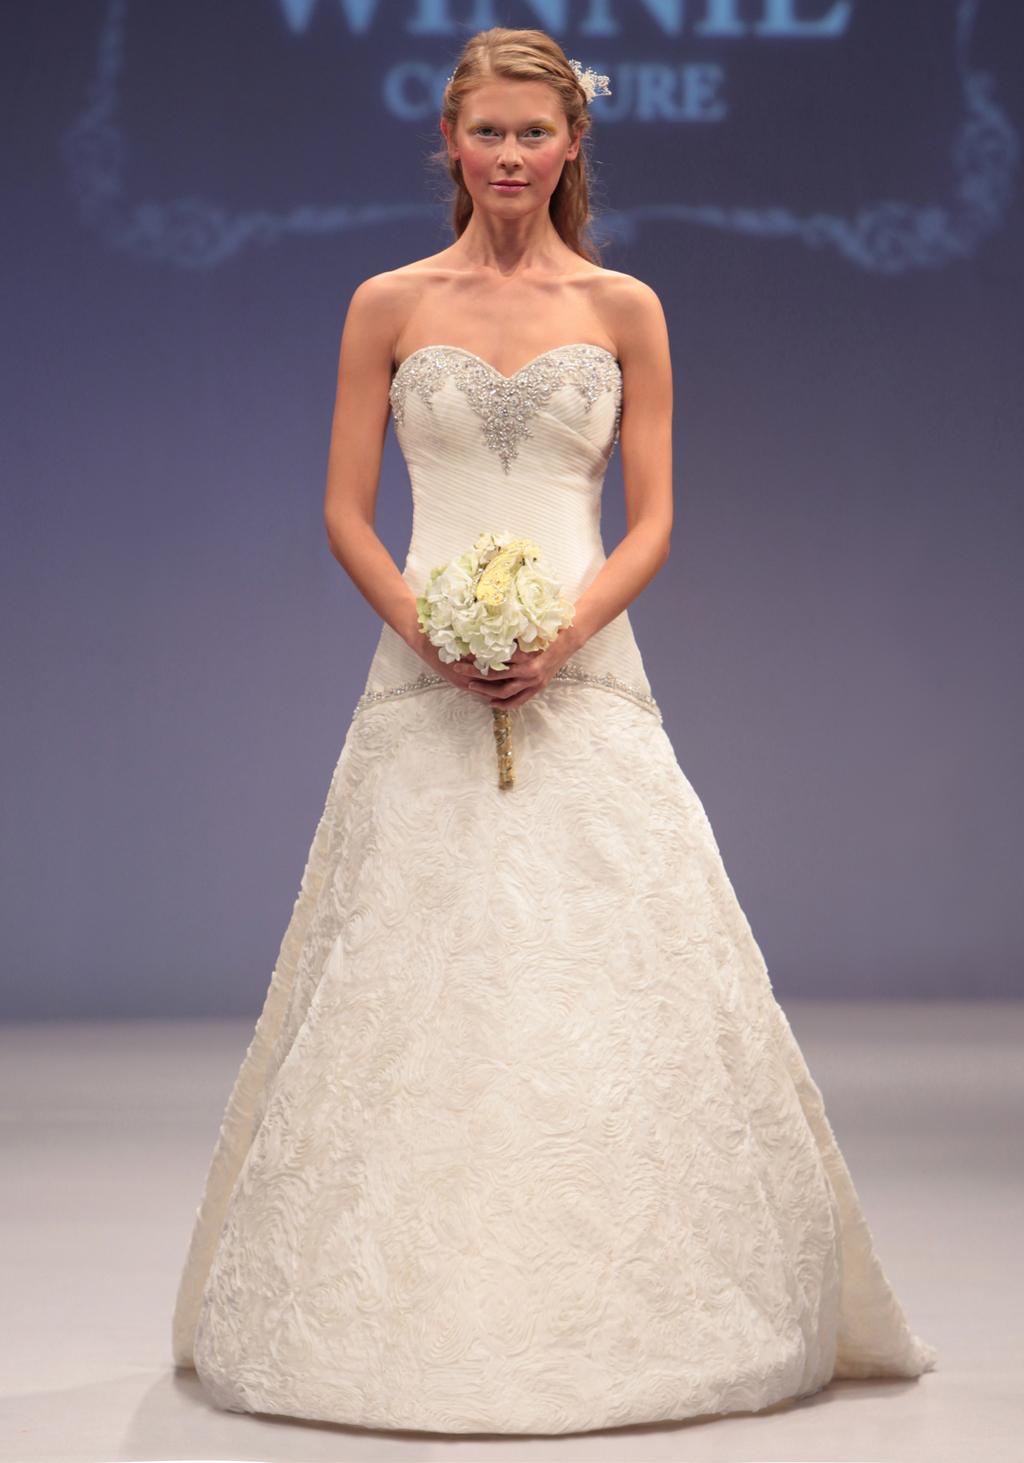 Winnie-couture-bridal-gown-spring-2013-wedding-dress-mirabella.full